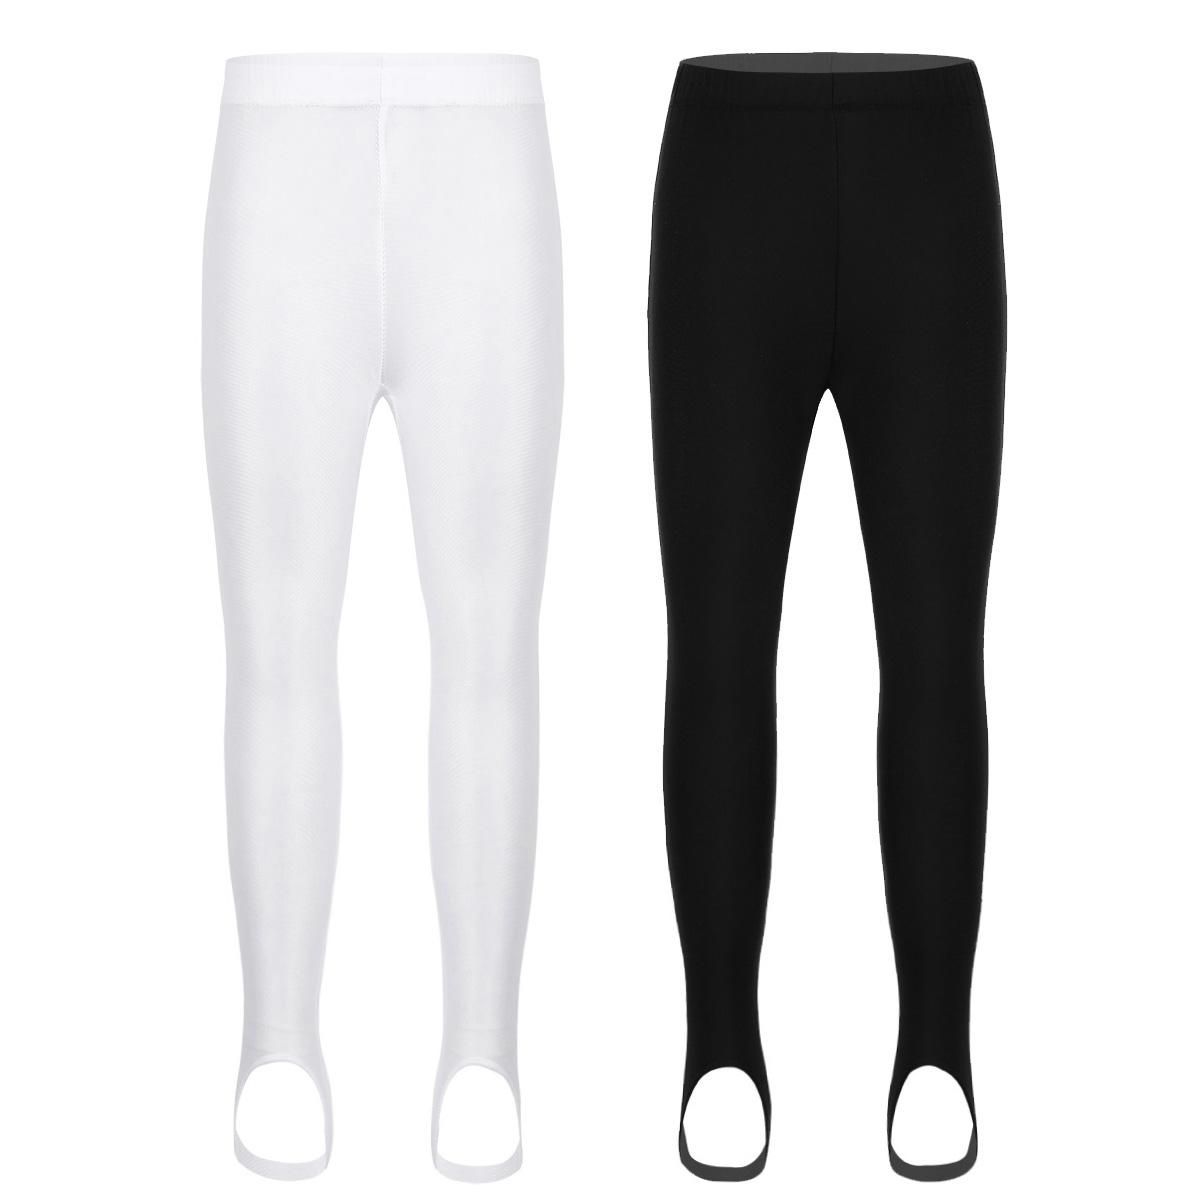 TiaoBug Kids Girls Black Dance Jazz Pants Trousers Stretchy Loose Capri Length Ballet Gymnastics Yoga